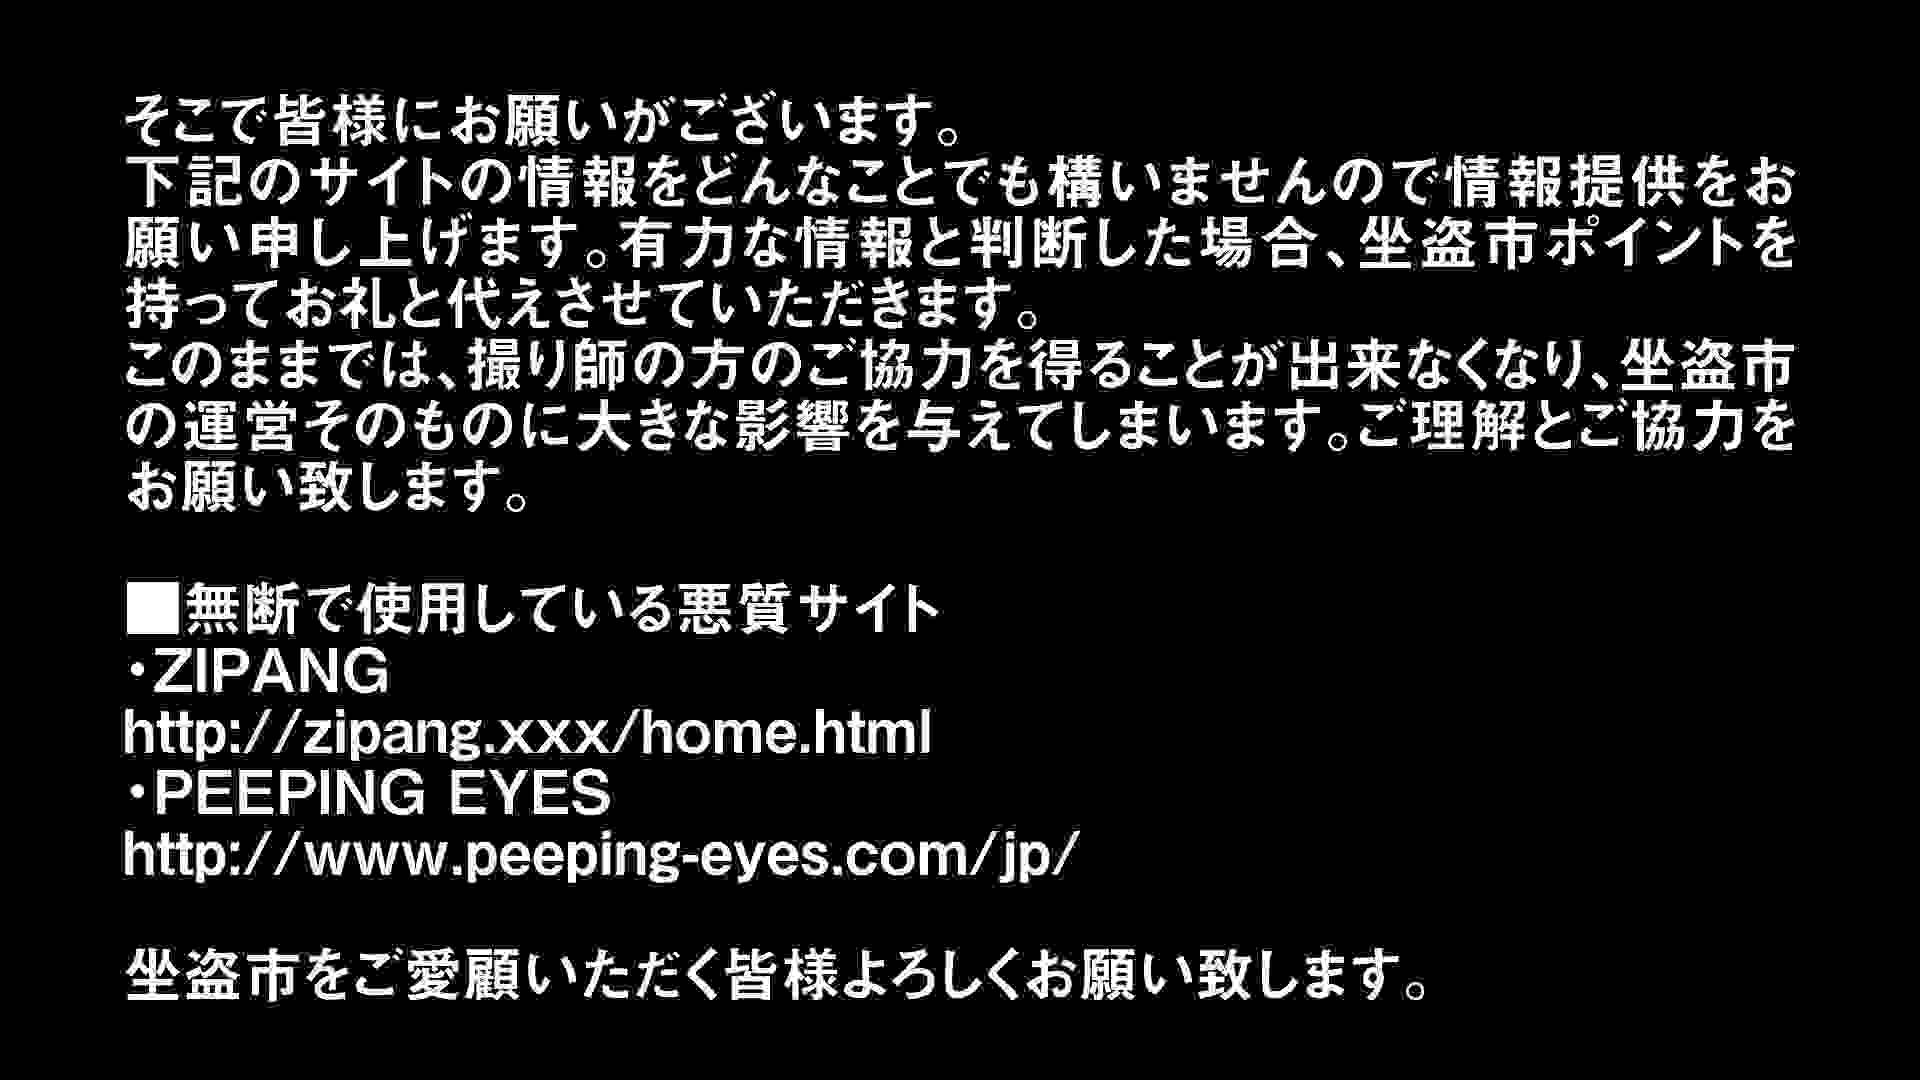 Aquaな露天風呂Vol.300 盗撮シリーズ | 露天風呂編  110PIX 35